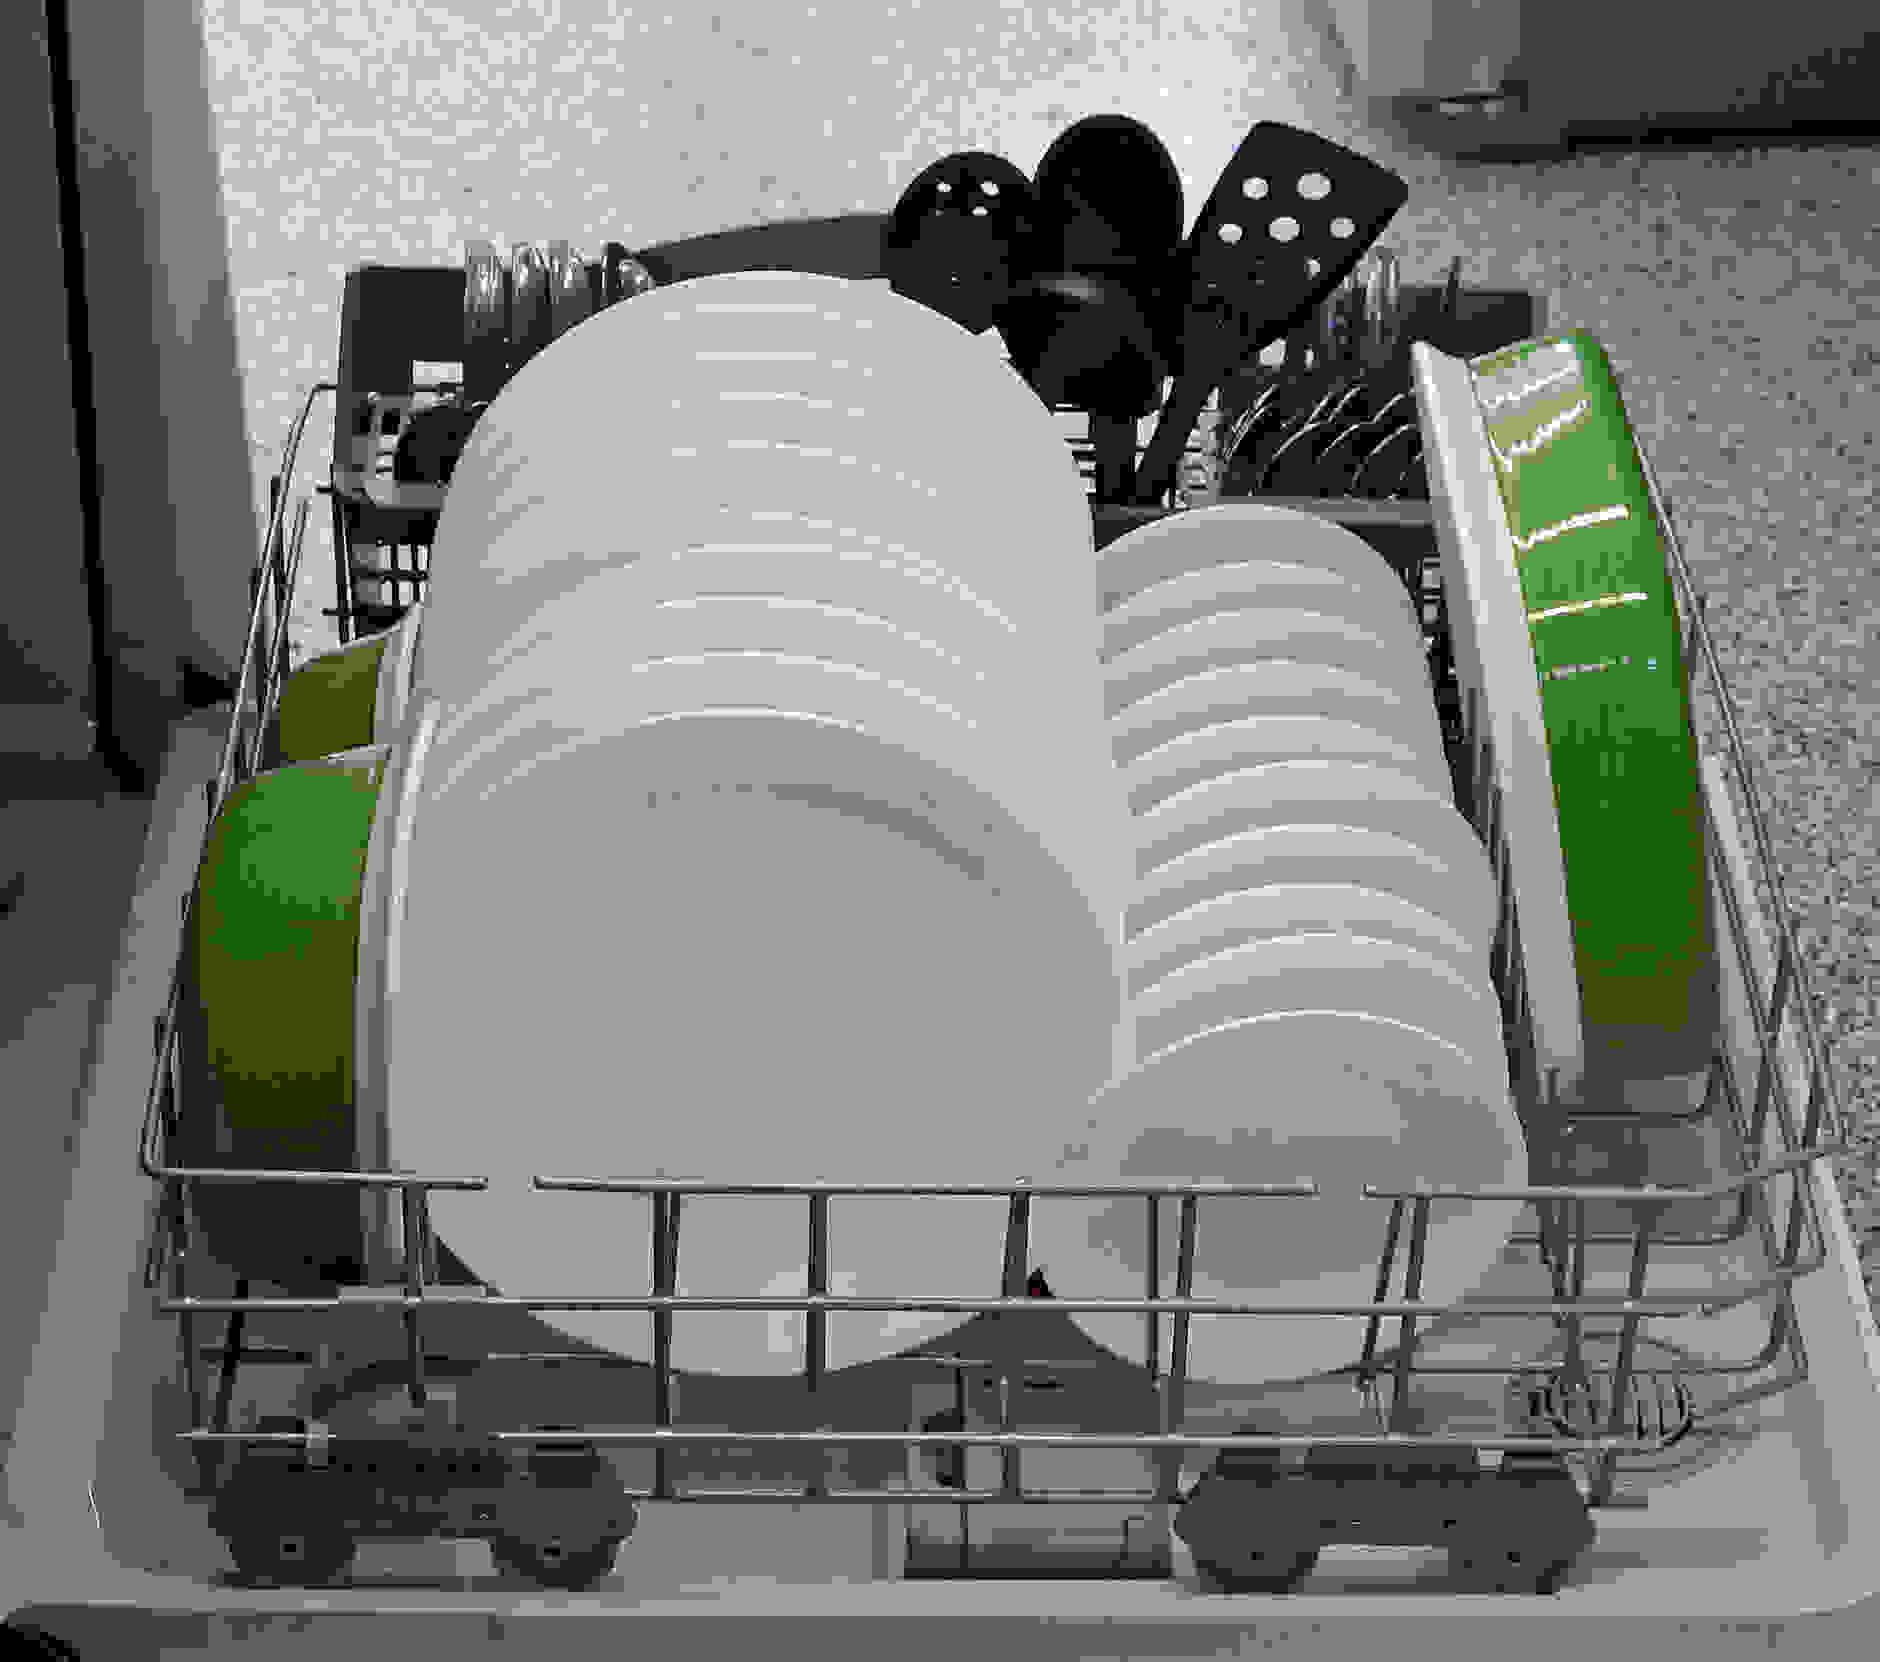 Kenmore 13042 bottom rack capacity